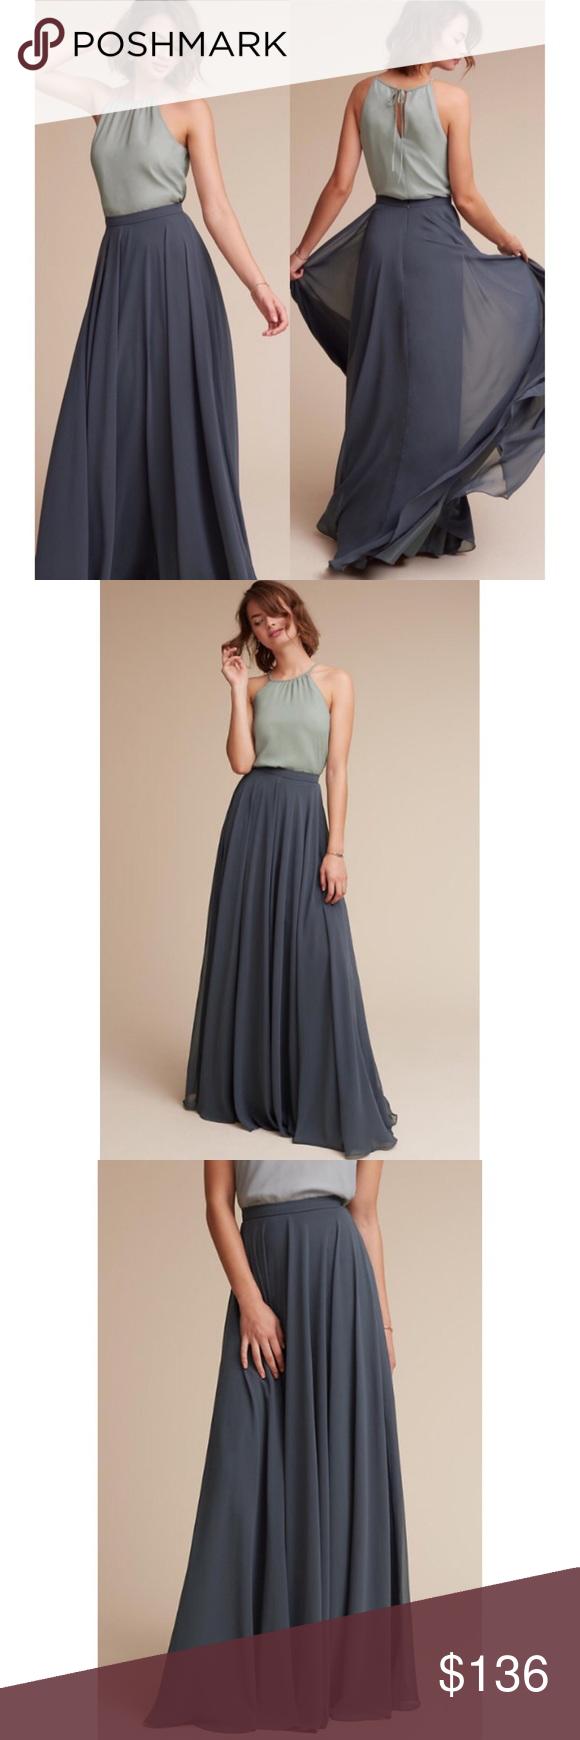 b945d1eb78 Jenny Yoo Hampton Skirt BHLDN Anthropologie Bridal Jenny Yoo Collection  Hampton Formal Long Skirt From BHLDN